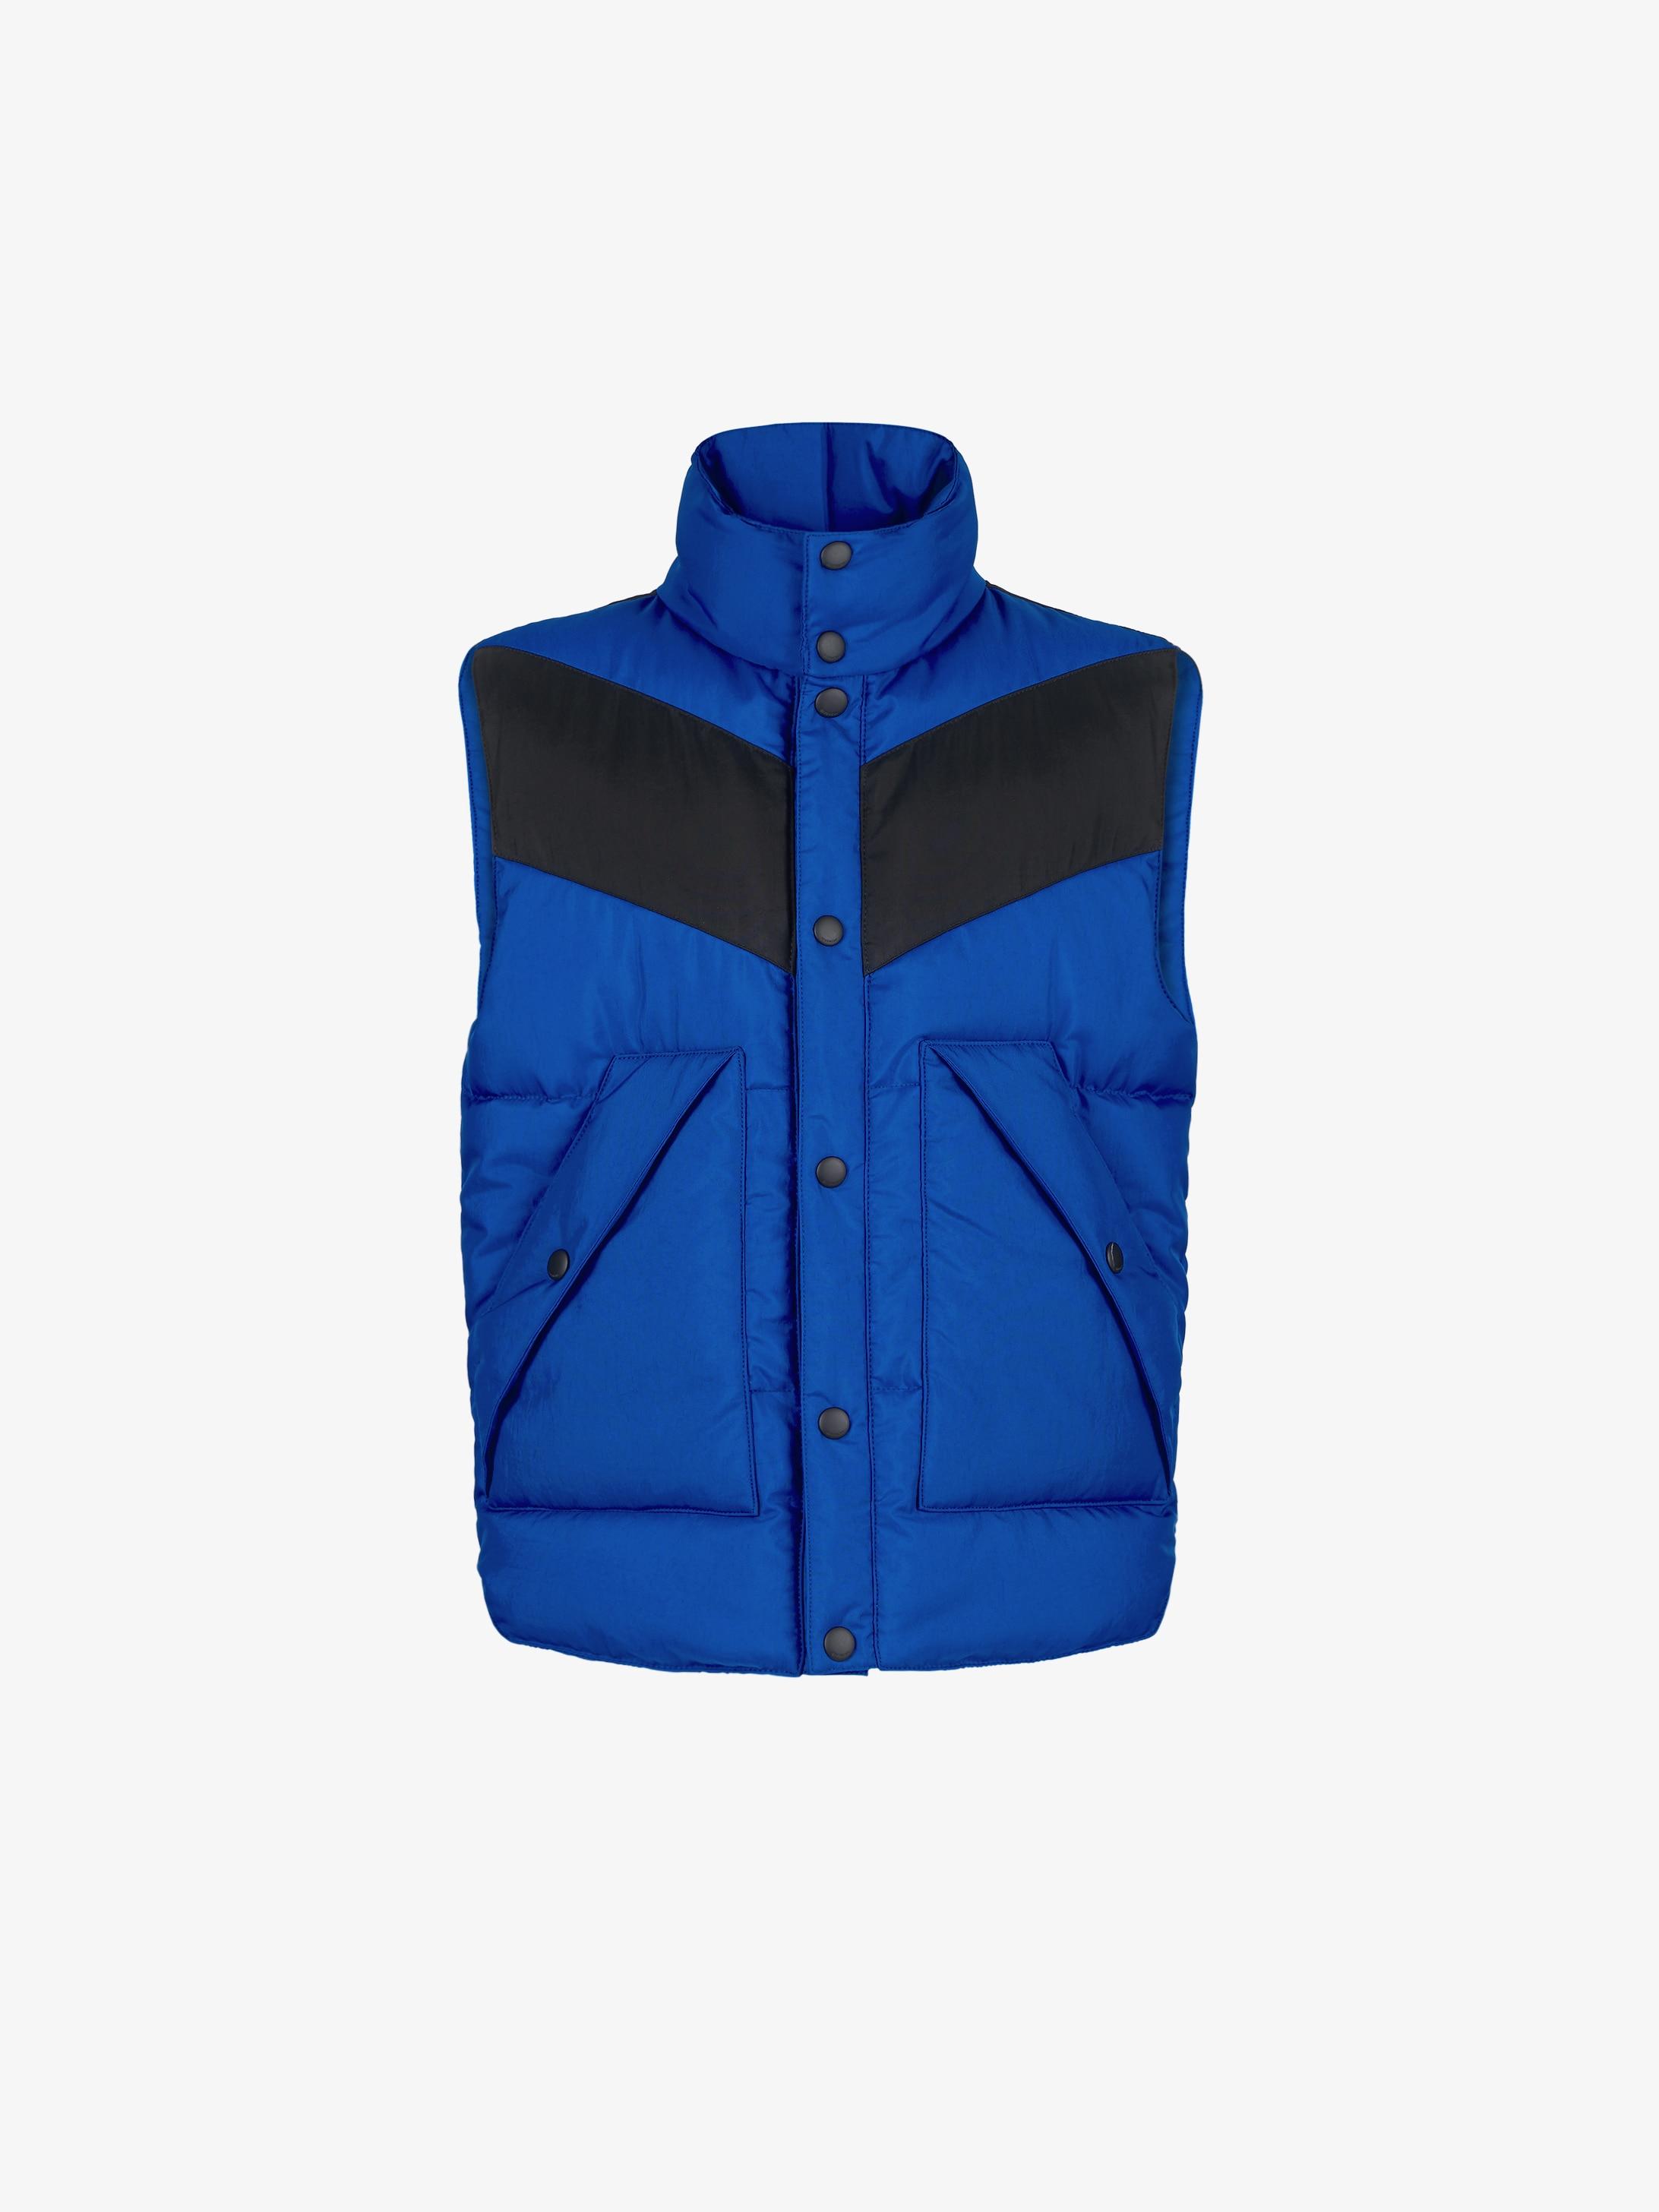 Color block sleeveless puffa jacket